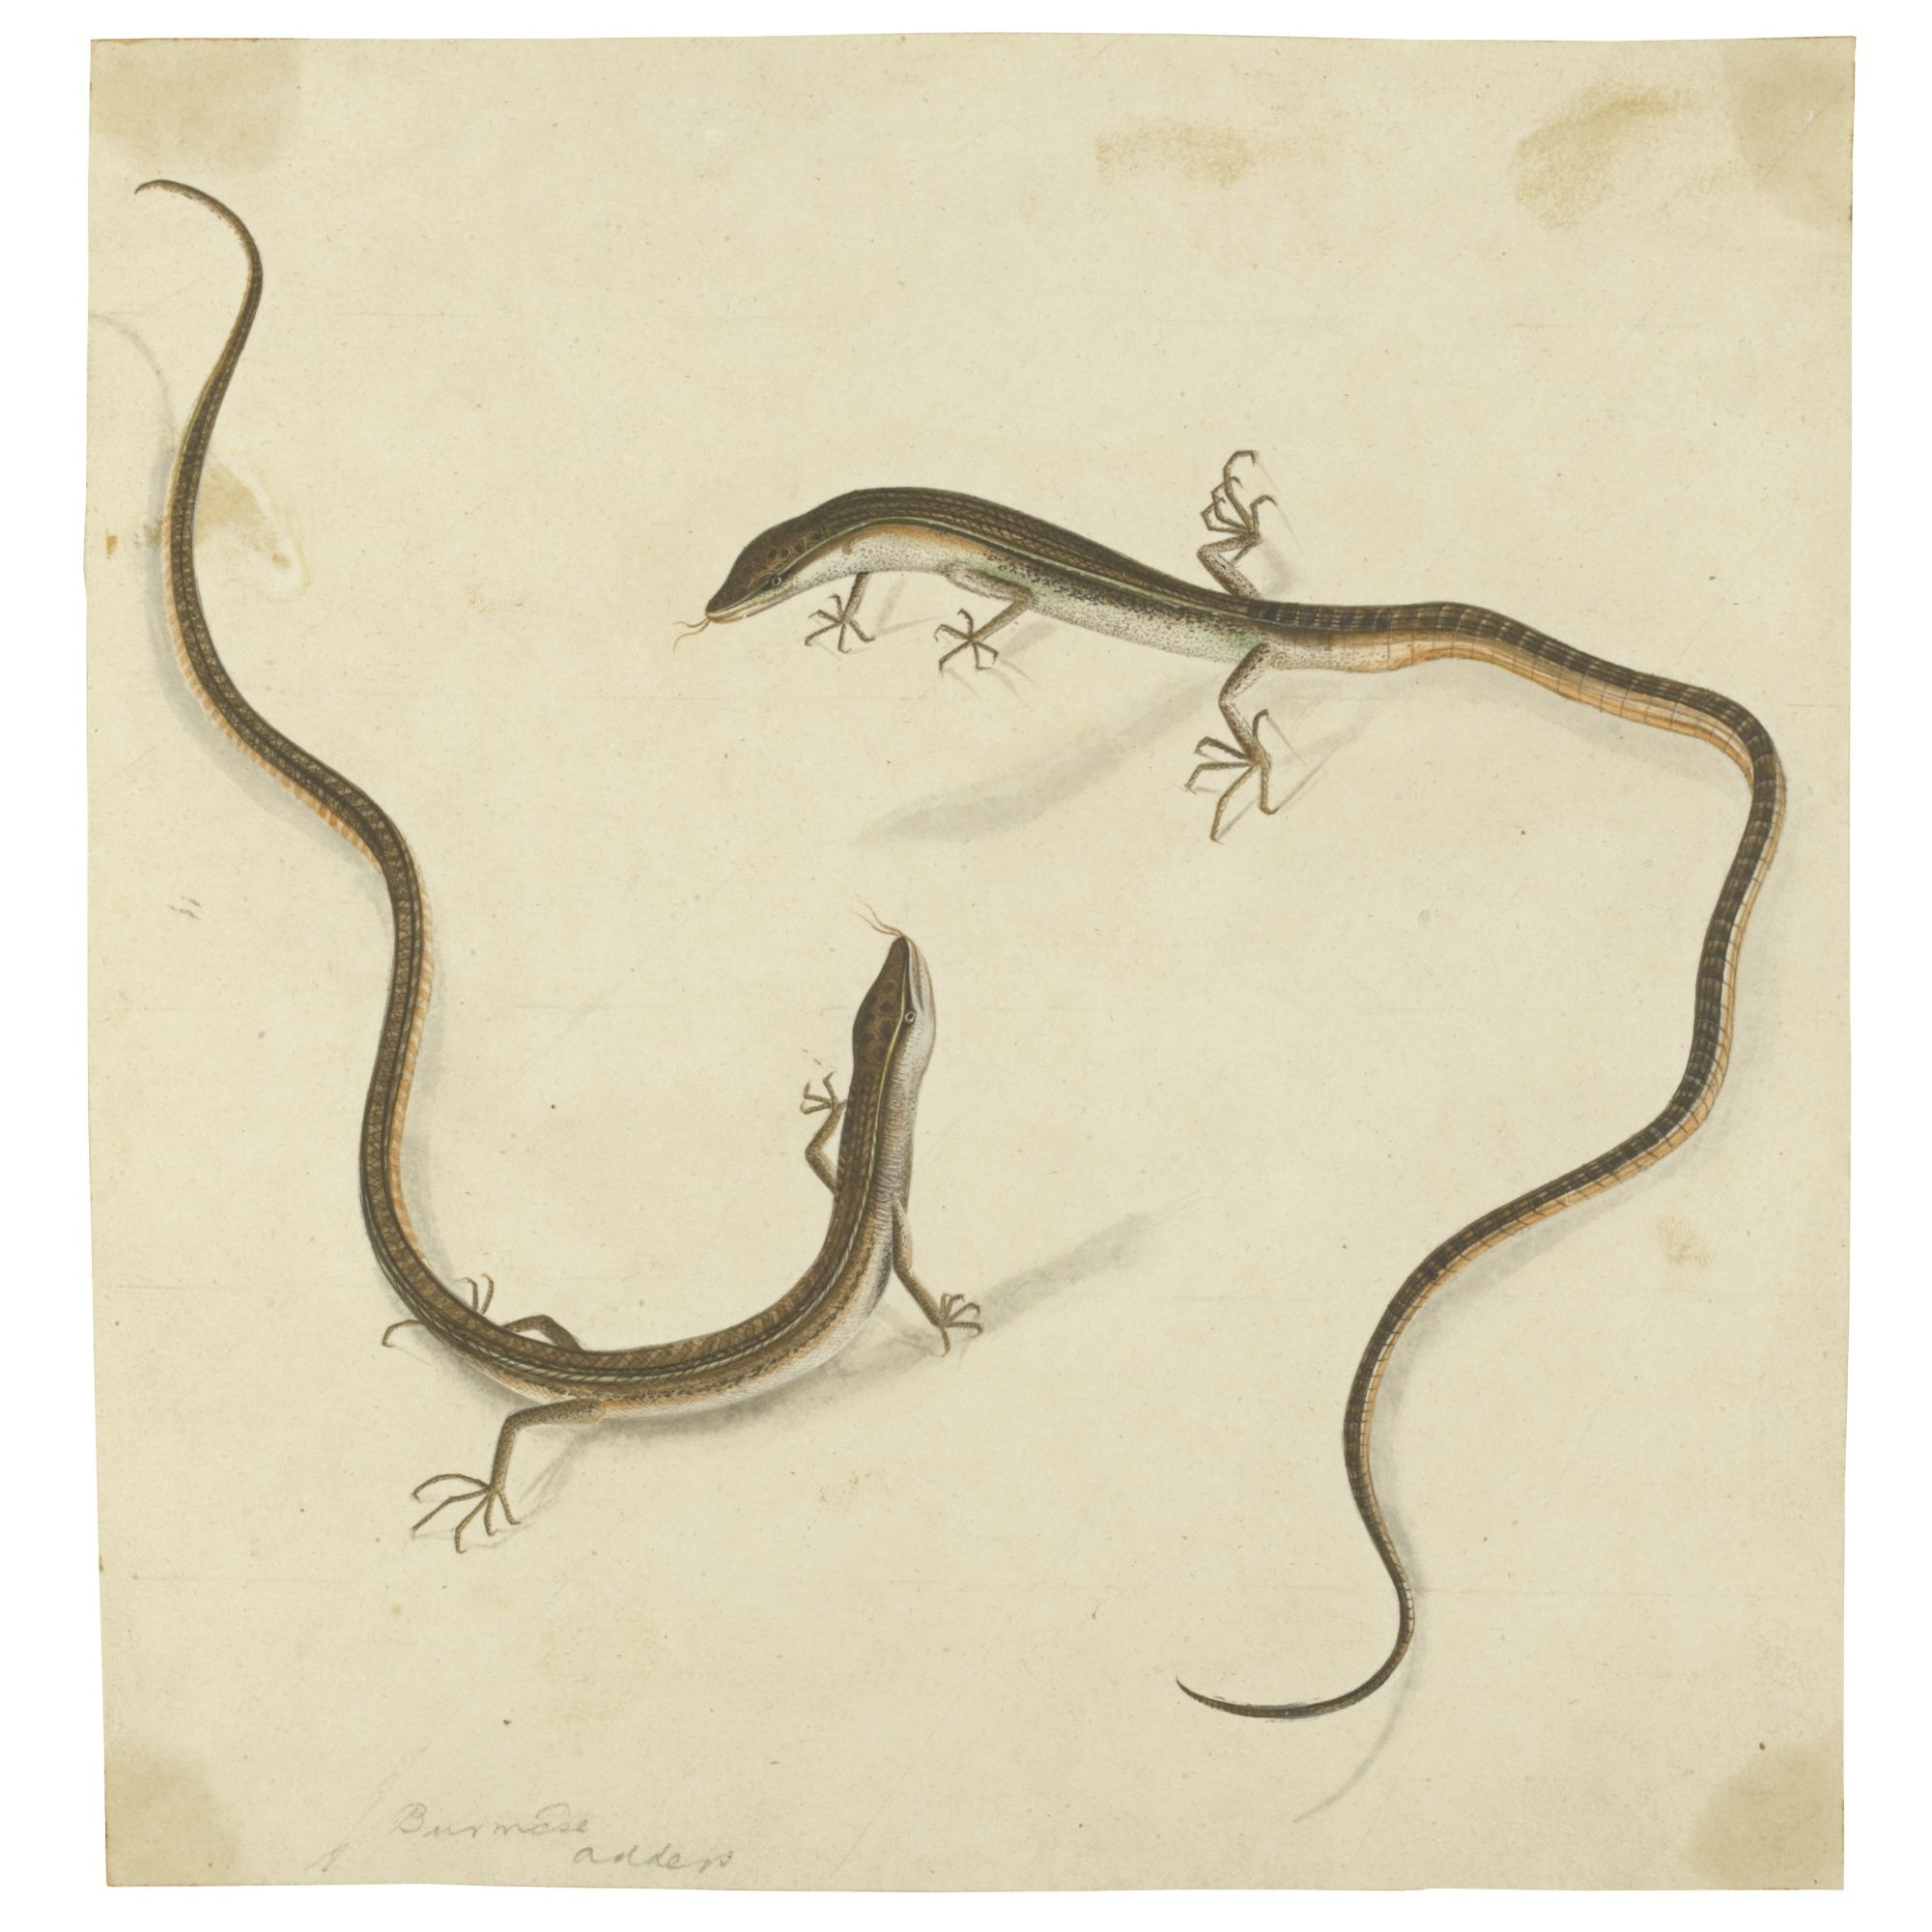 TWO BURMESE ADDERS, COMPANY SCHOOL, PROBABLY BARRACKPUR, CALCUTTA, CIRCA 1810 | lot | Sotheby's